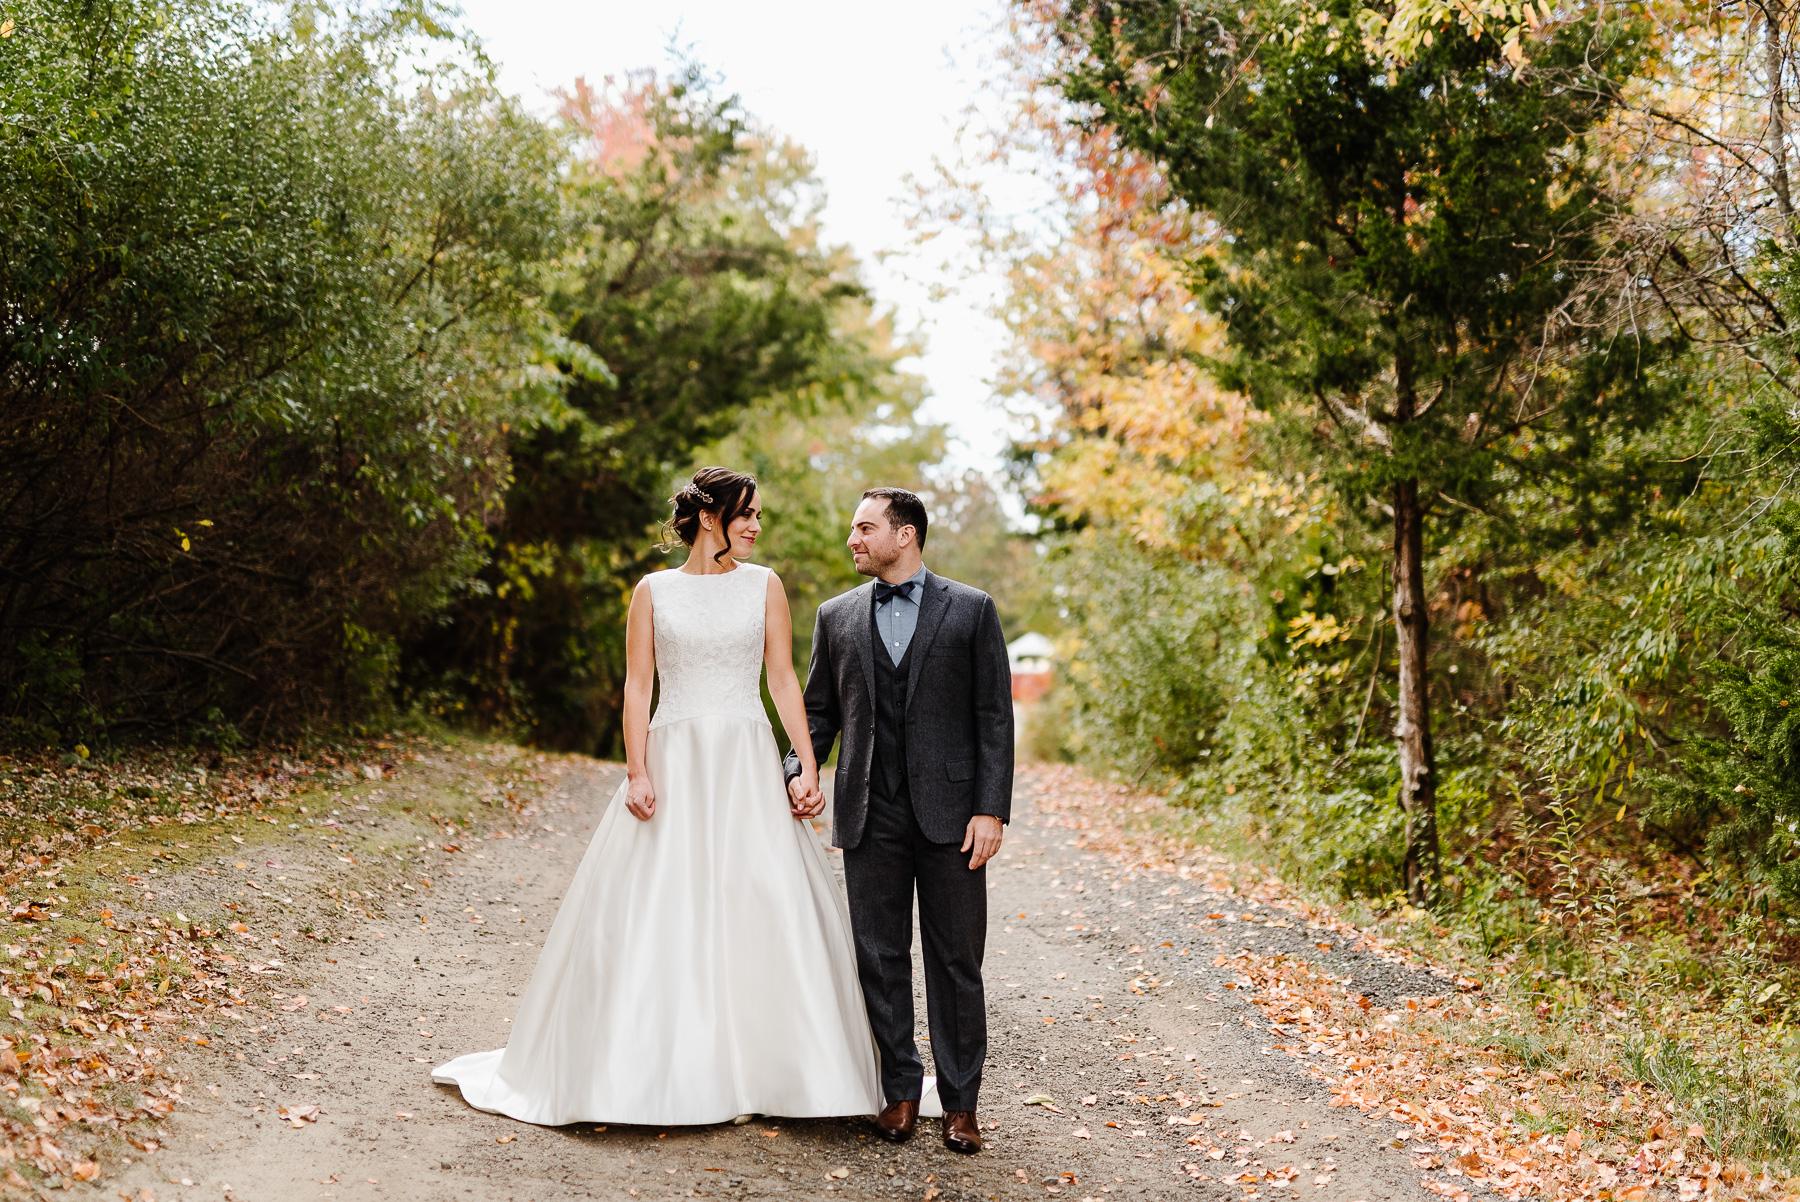 19-Laurita Winery Wedding New Jersey Wedding Photographer Laurita Winery Weddings Longbrook Photography.jpg